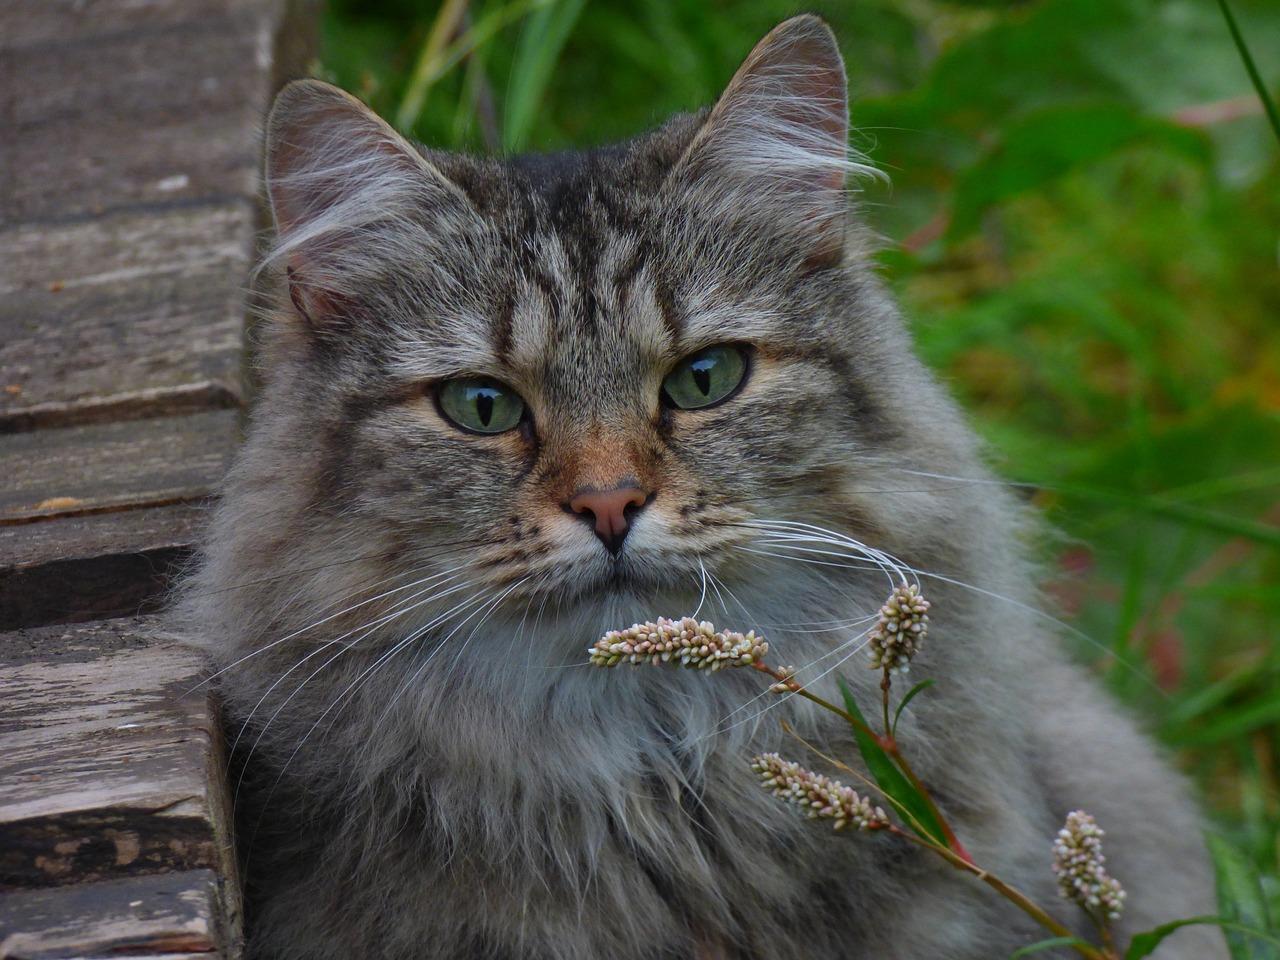 боб лесная скандинавская кошка фото вначале